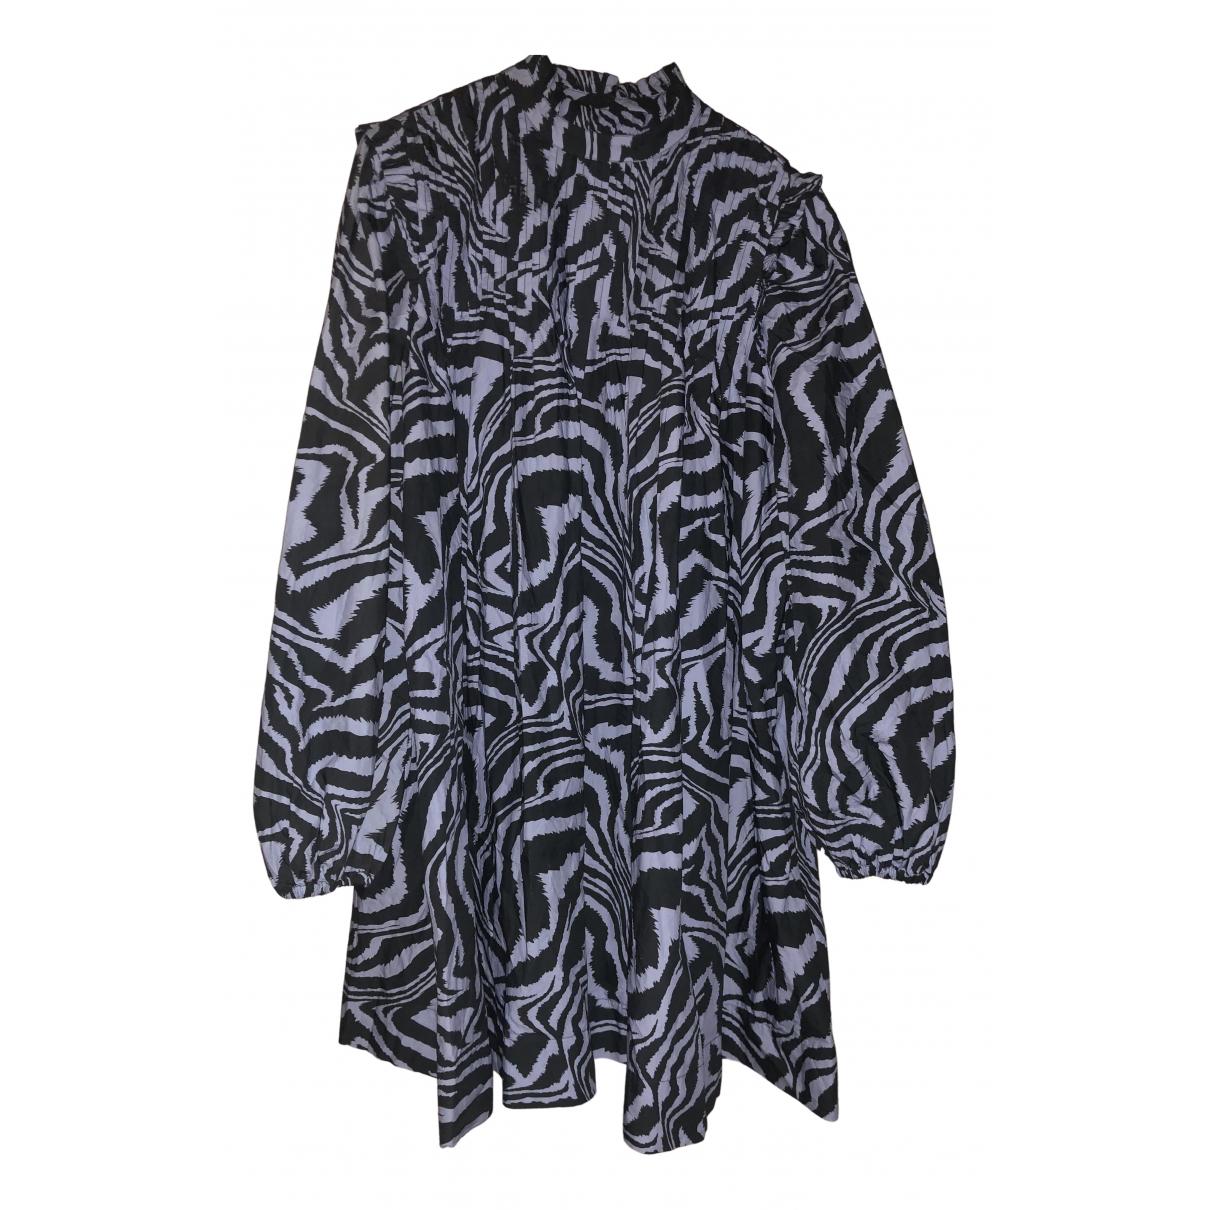 Ganni Spring Summer 2019 Blue Cotton dress for Women 36 FR